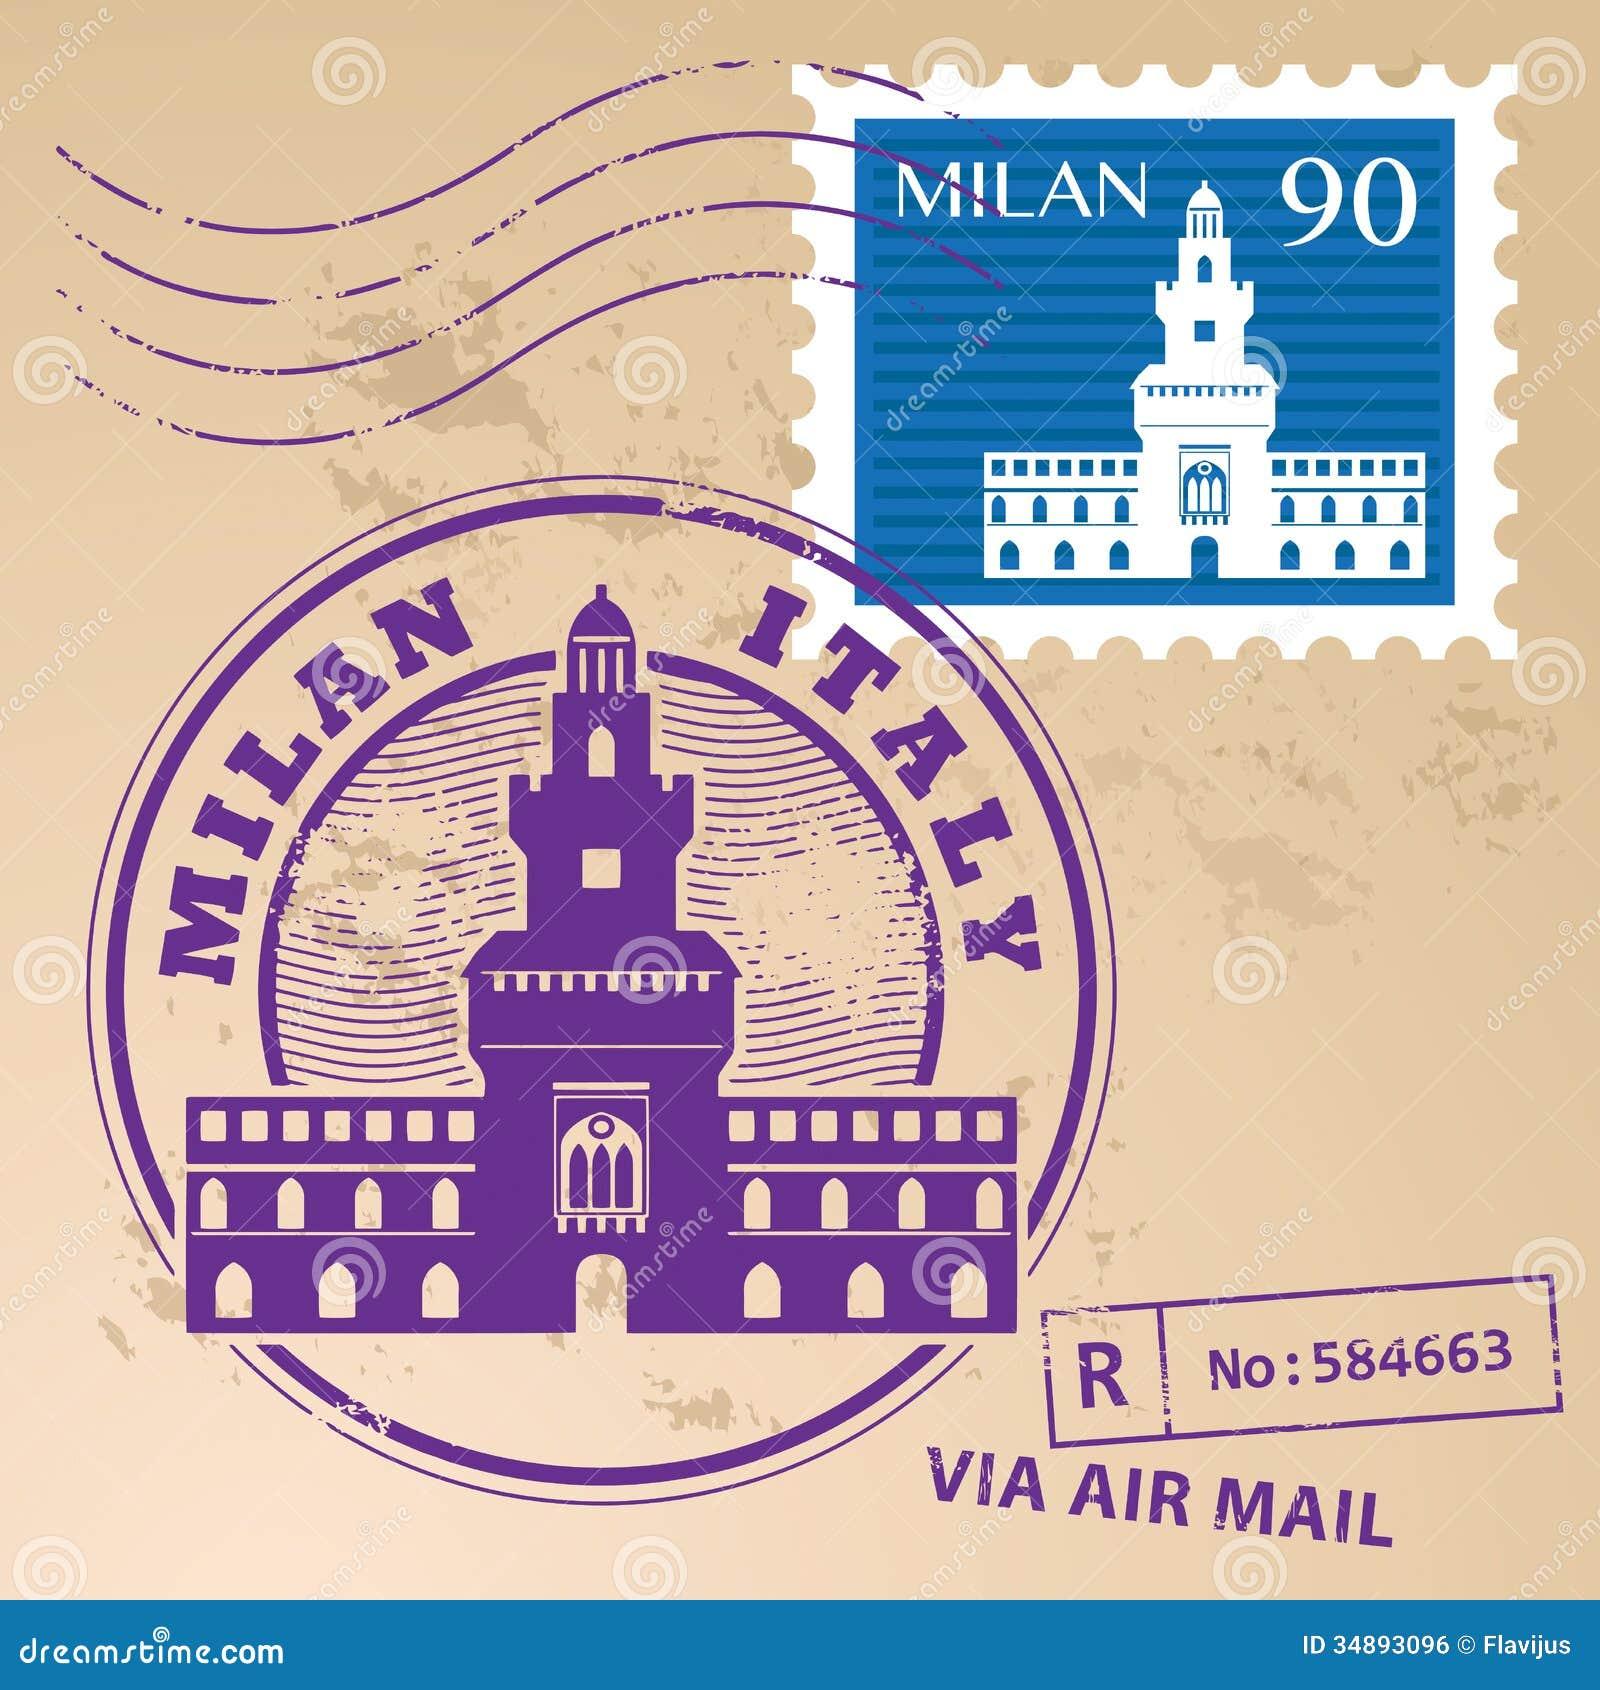 65c16f2dd5 Stamp set Milan stock vector. Illustration of label